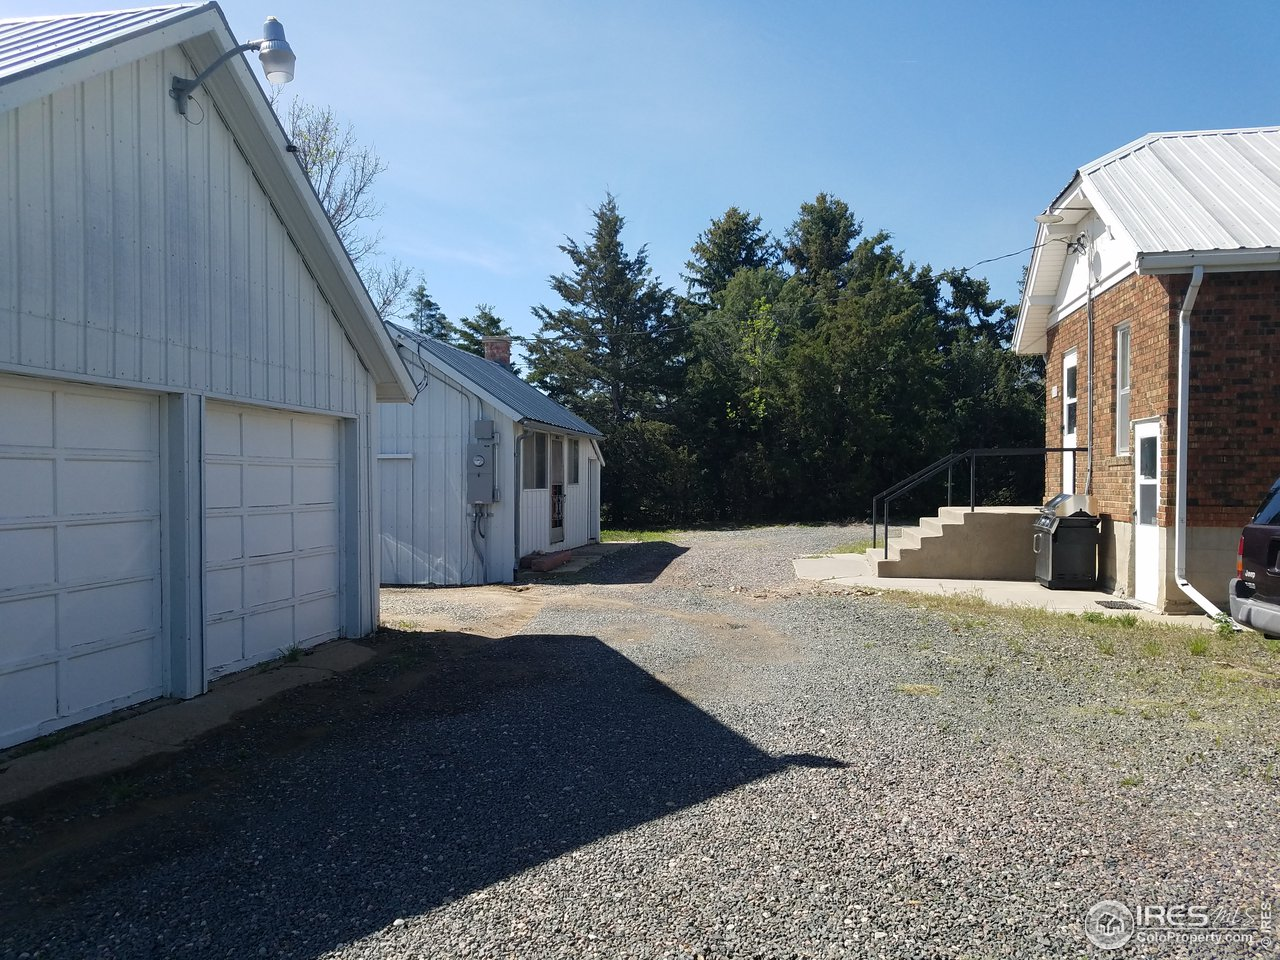 2 car garage and studio